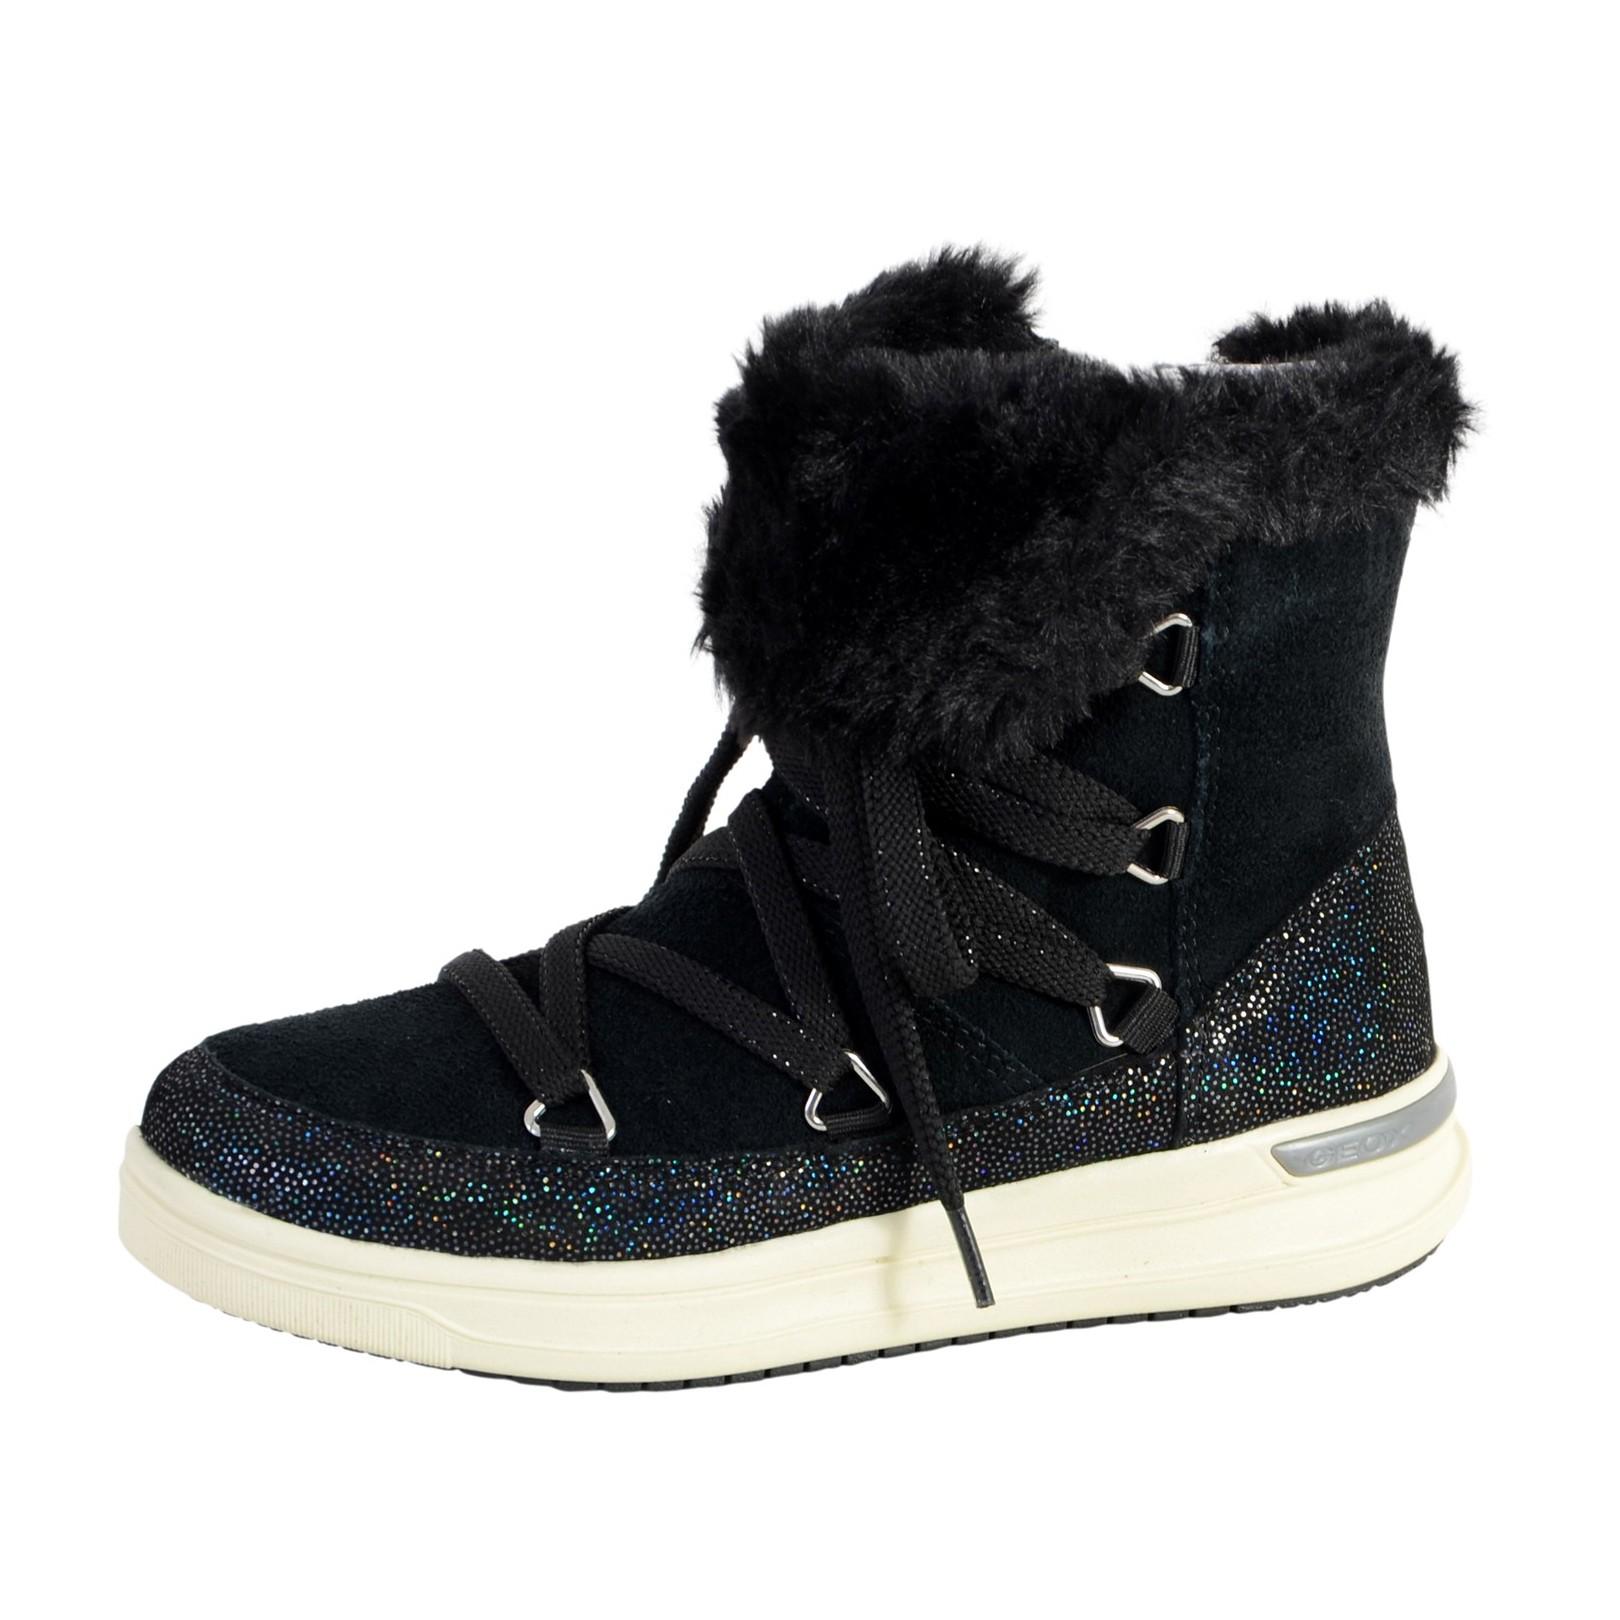 Chaussure Geox Enfant J Aveup G